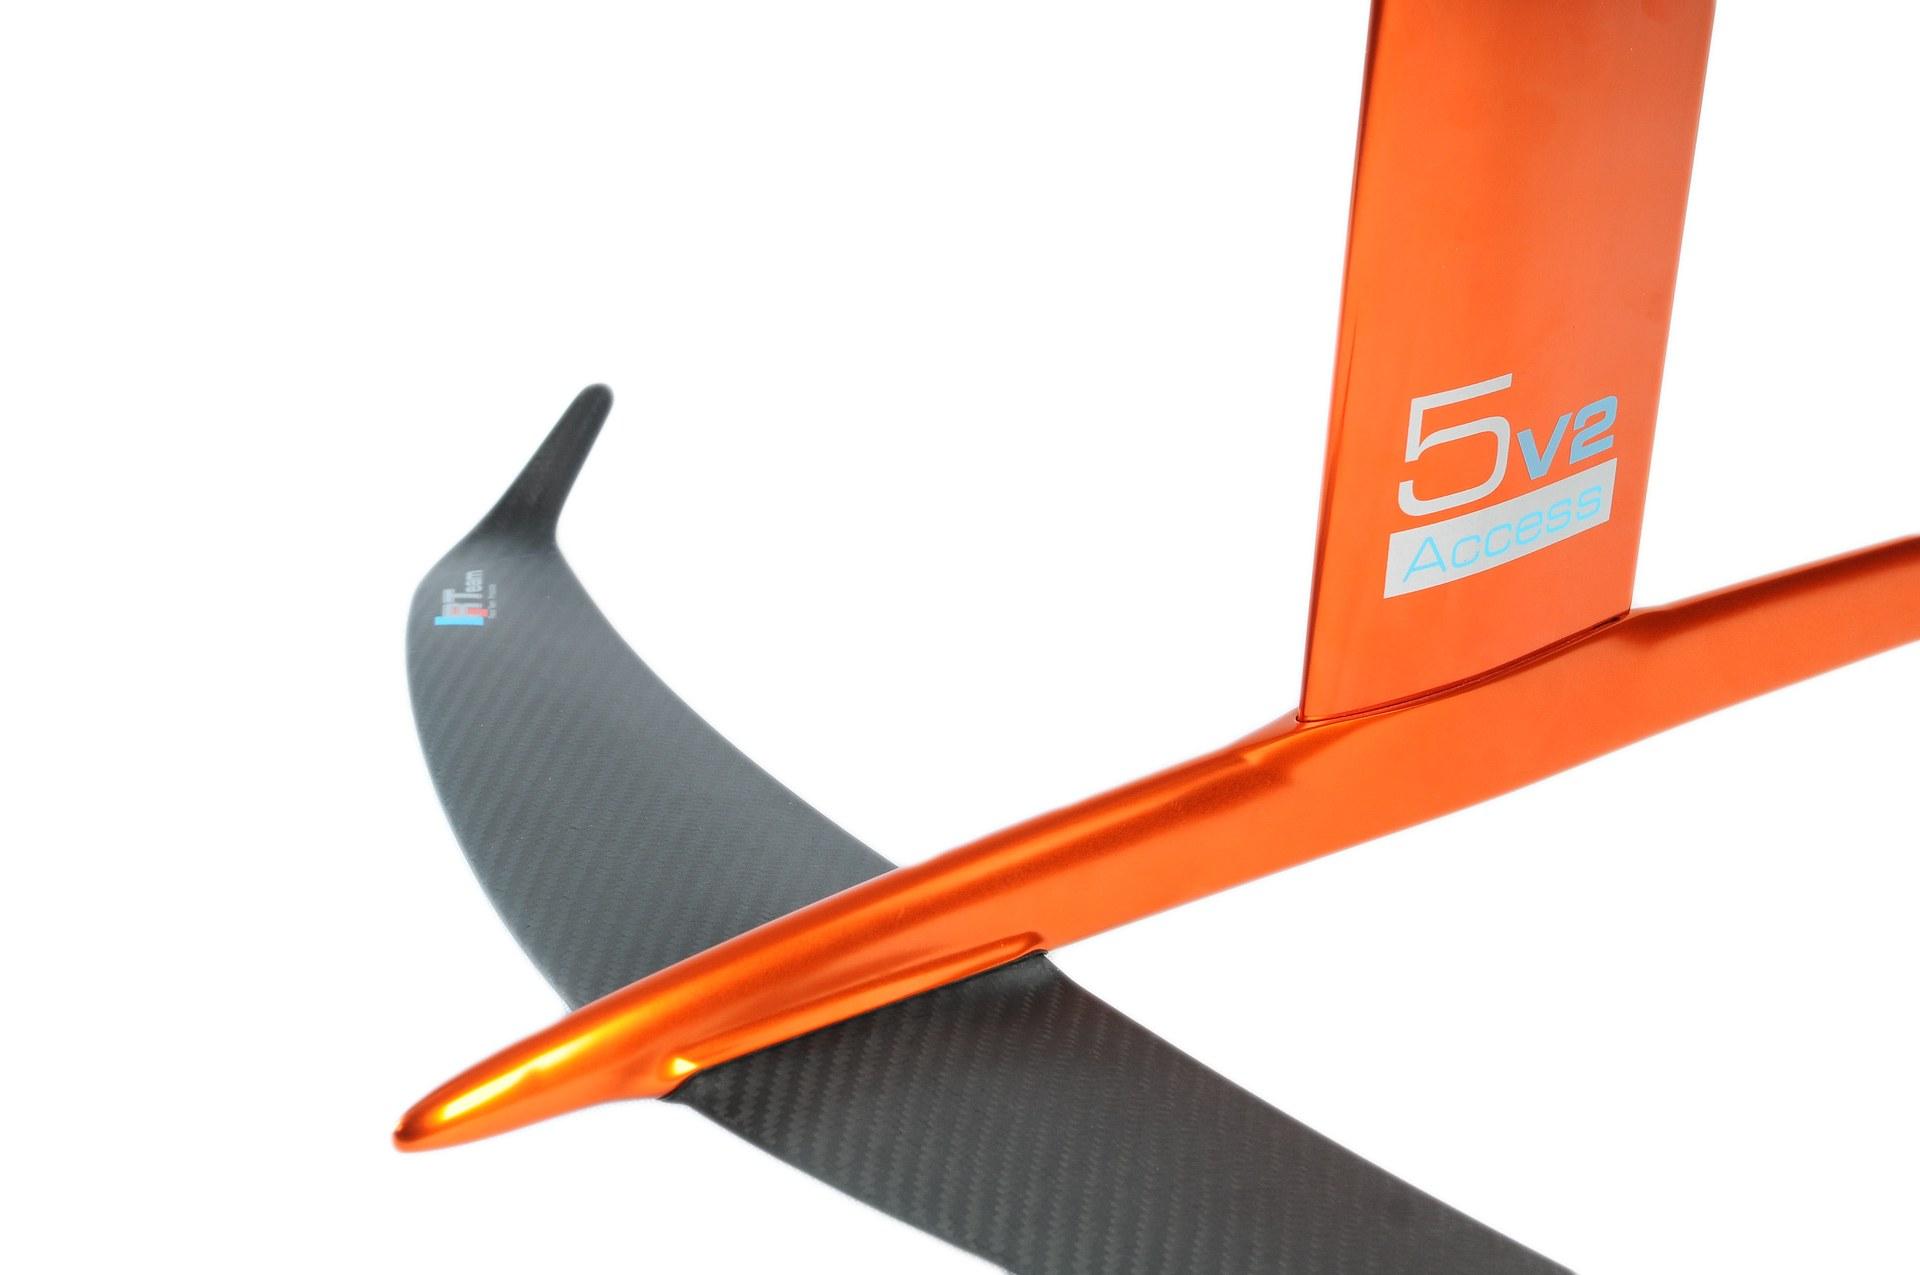 Kitefoil alpinefoil access v2 wing sport 2 1920